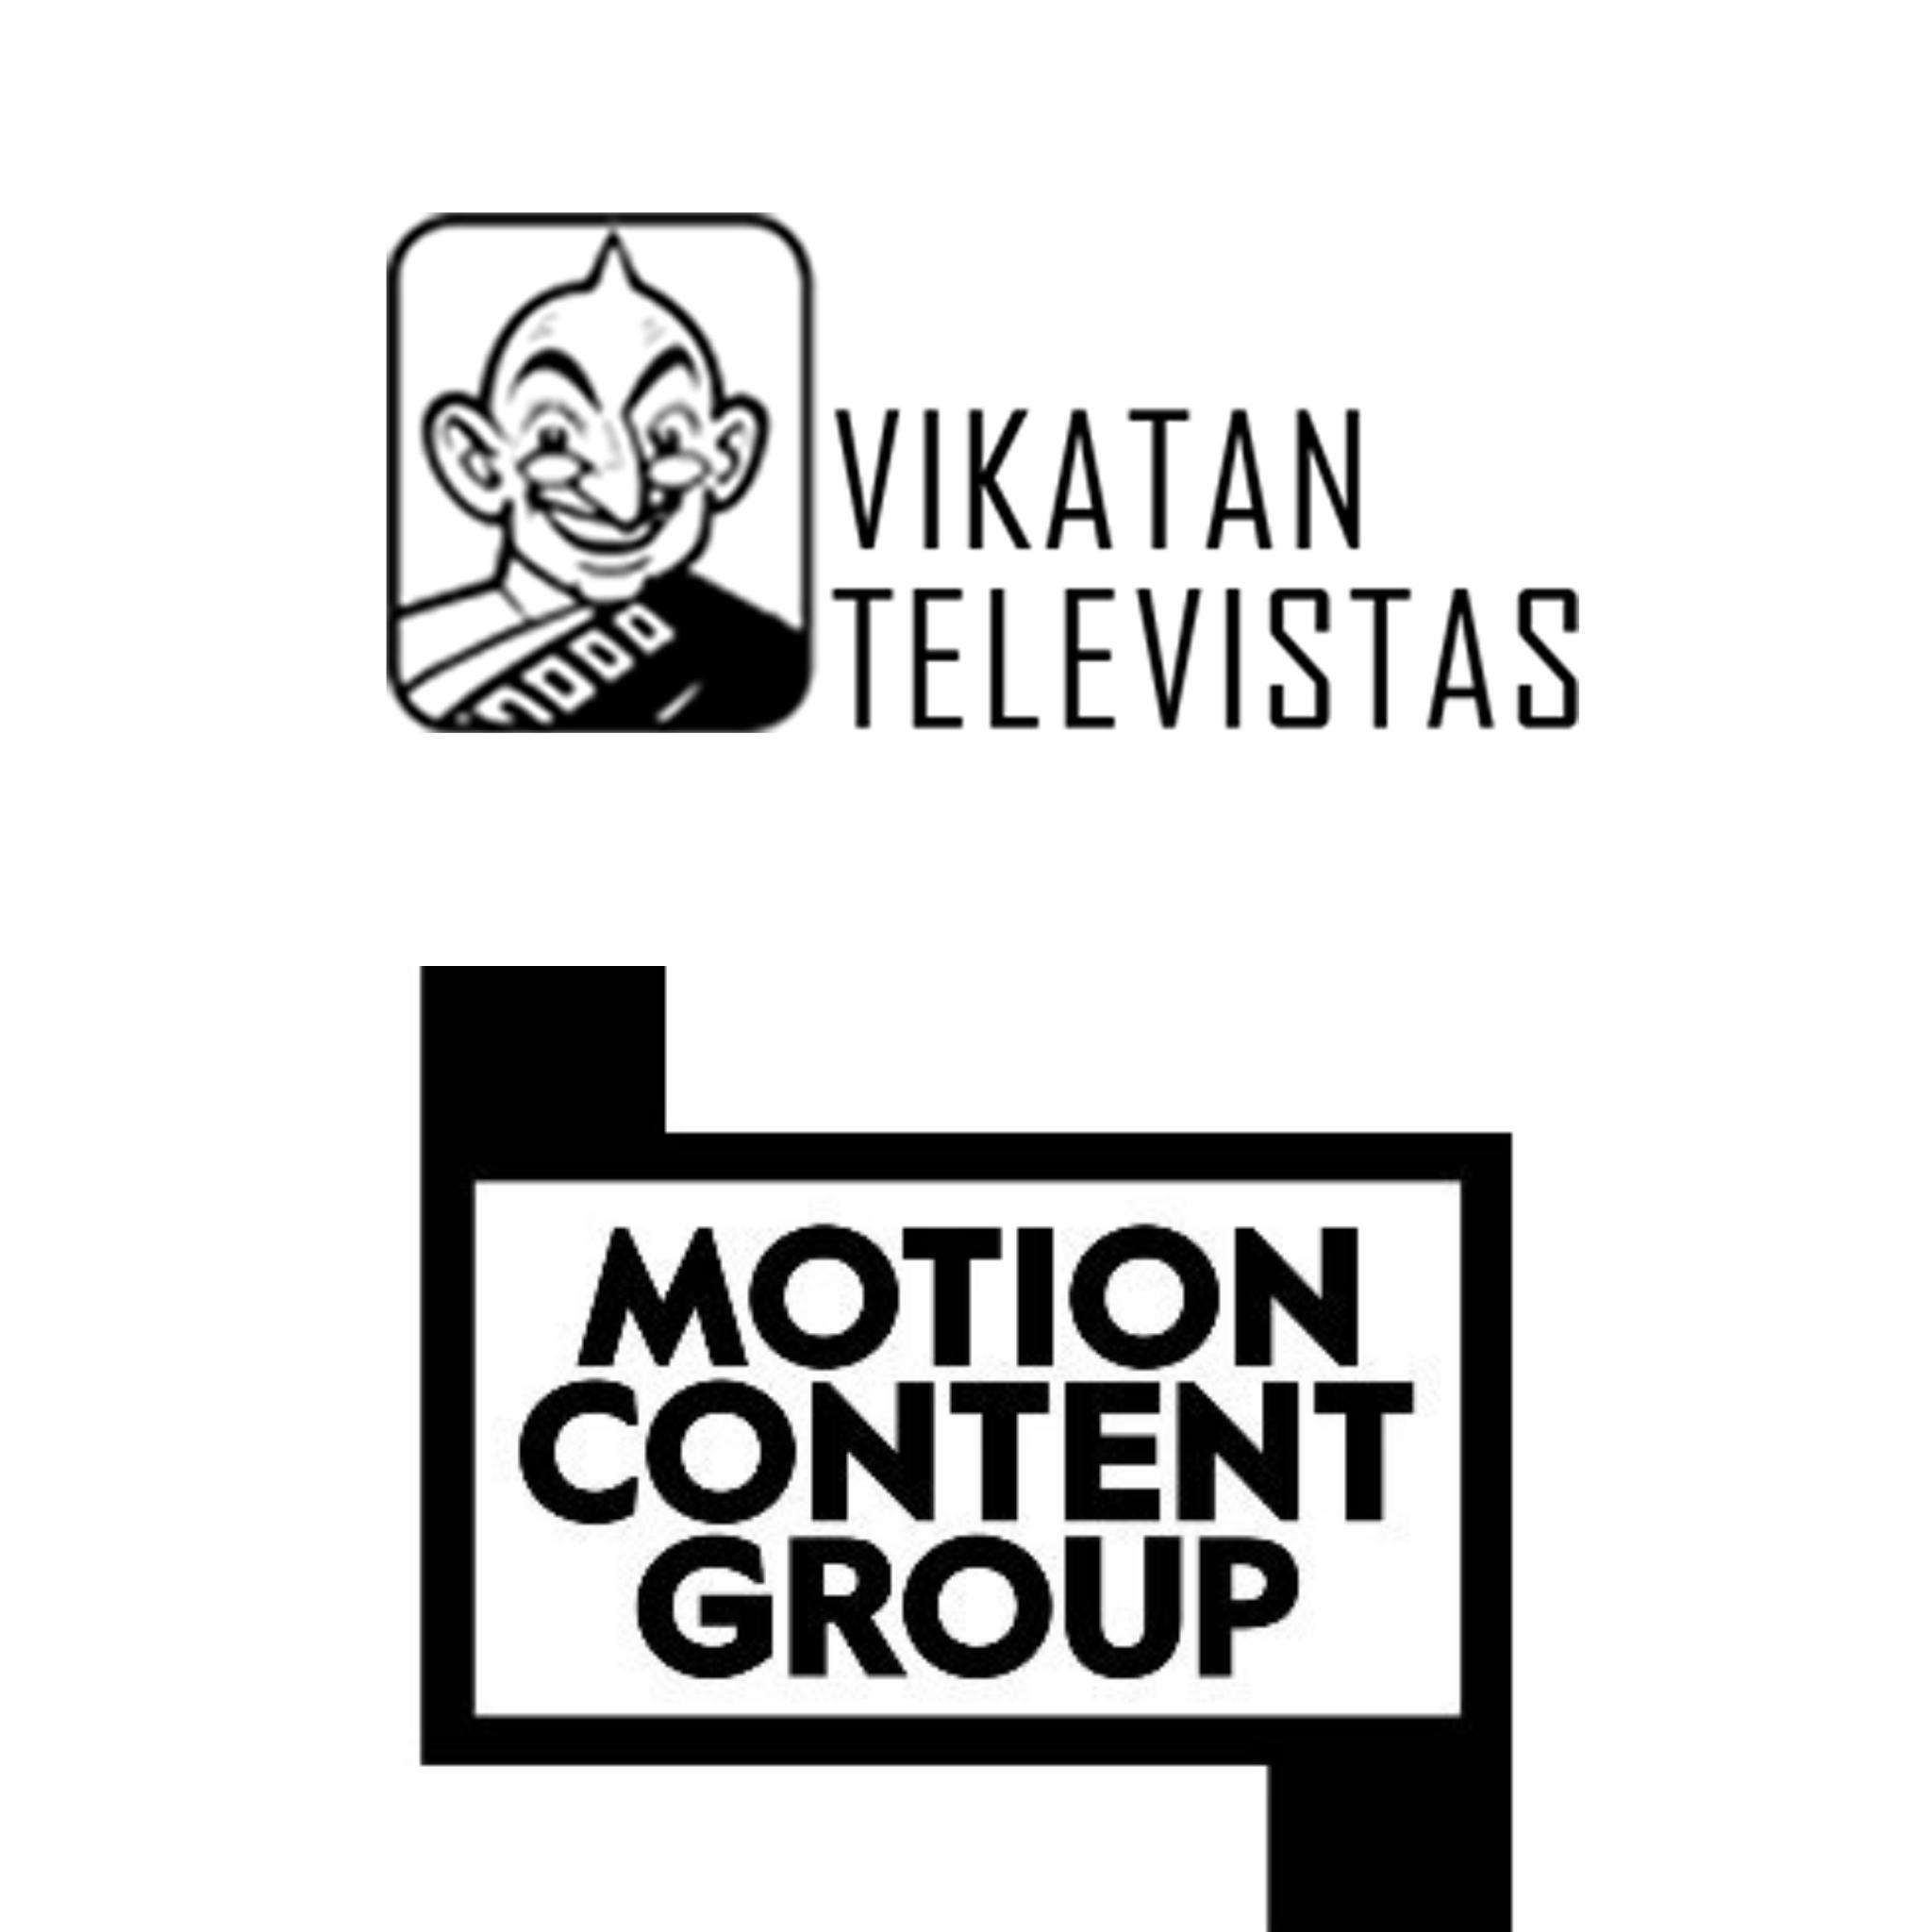 https://www.indiantelevision.com/sites/default/files/styles/smartcrop_800x800/public/images/tv-images/2021/07/30/photogrid_plus_1627636661490.jpg?itok=NFgd_Y_v